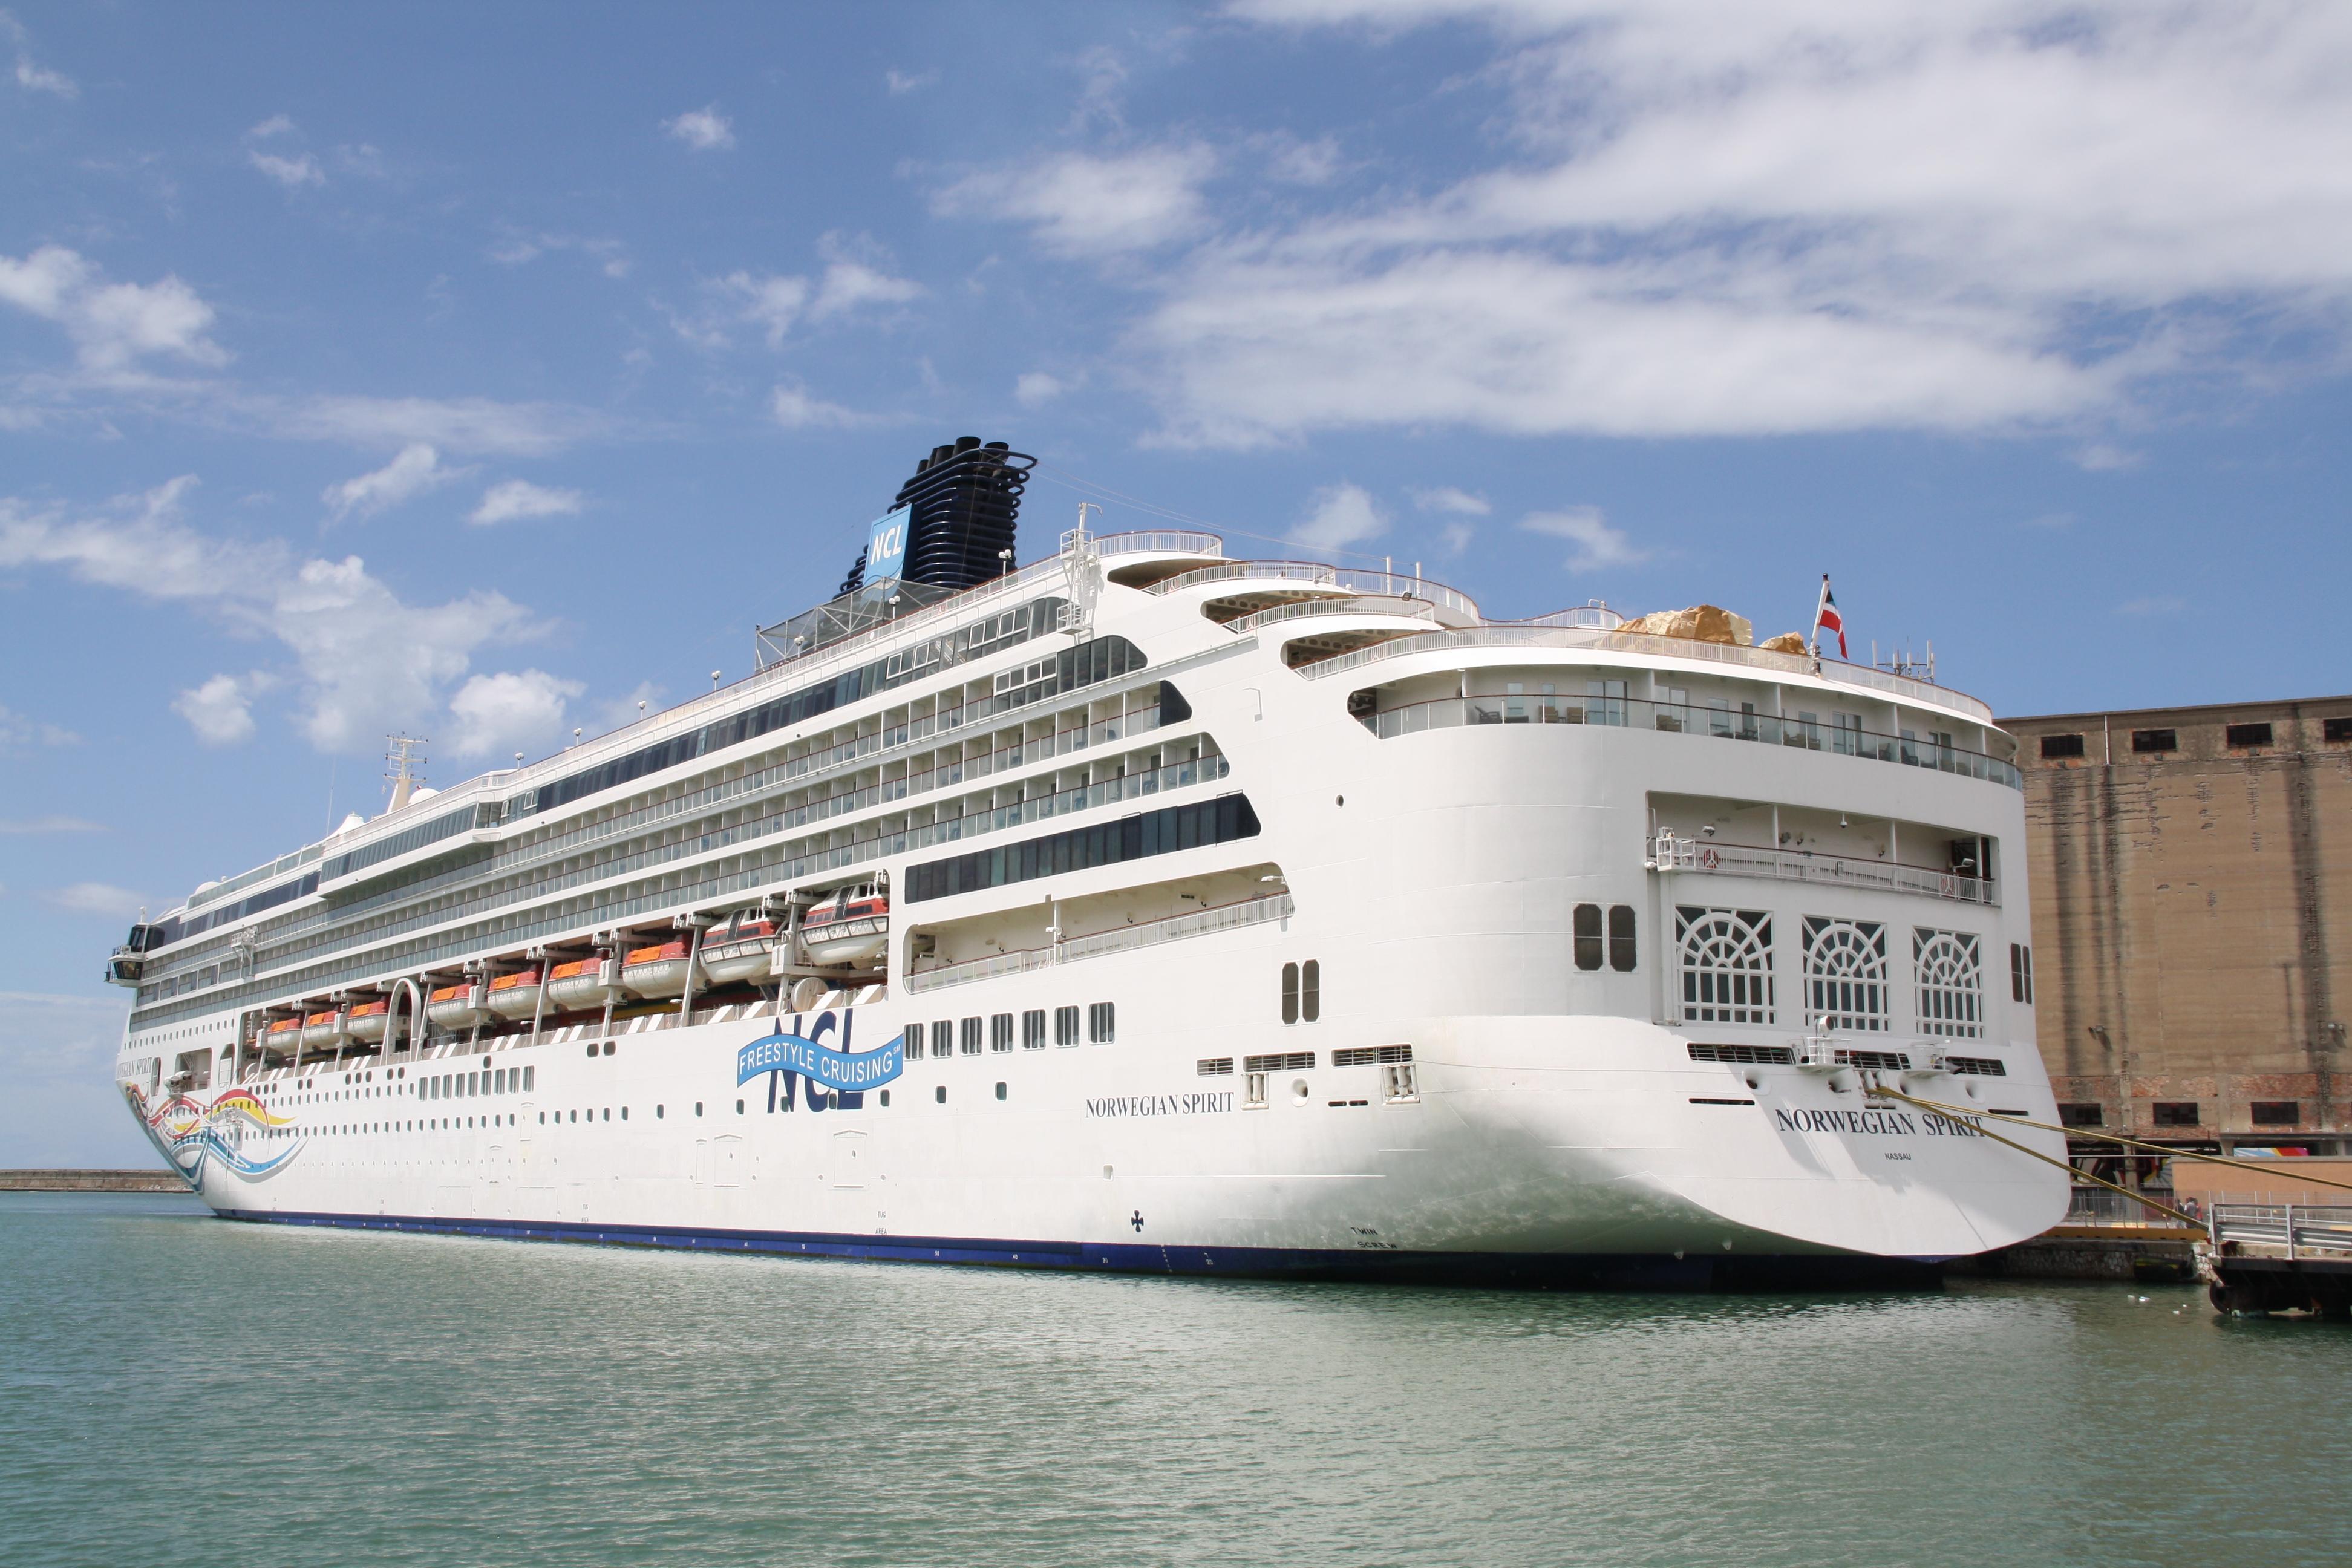 Norwegian Cruise Line Room Service Menu